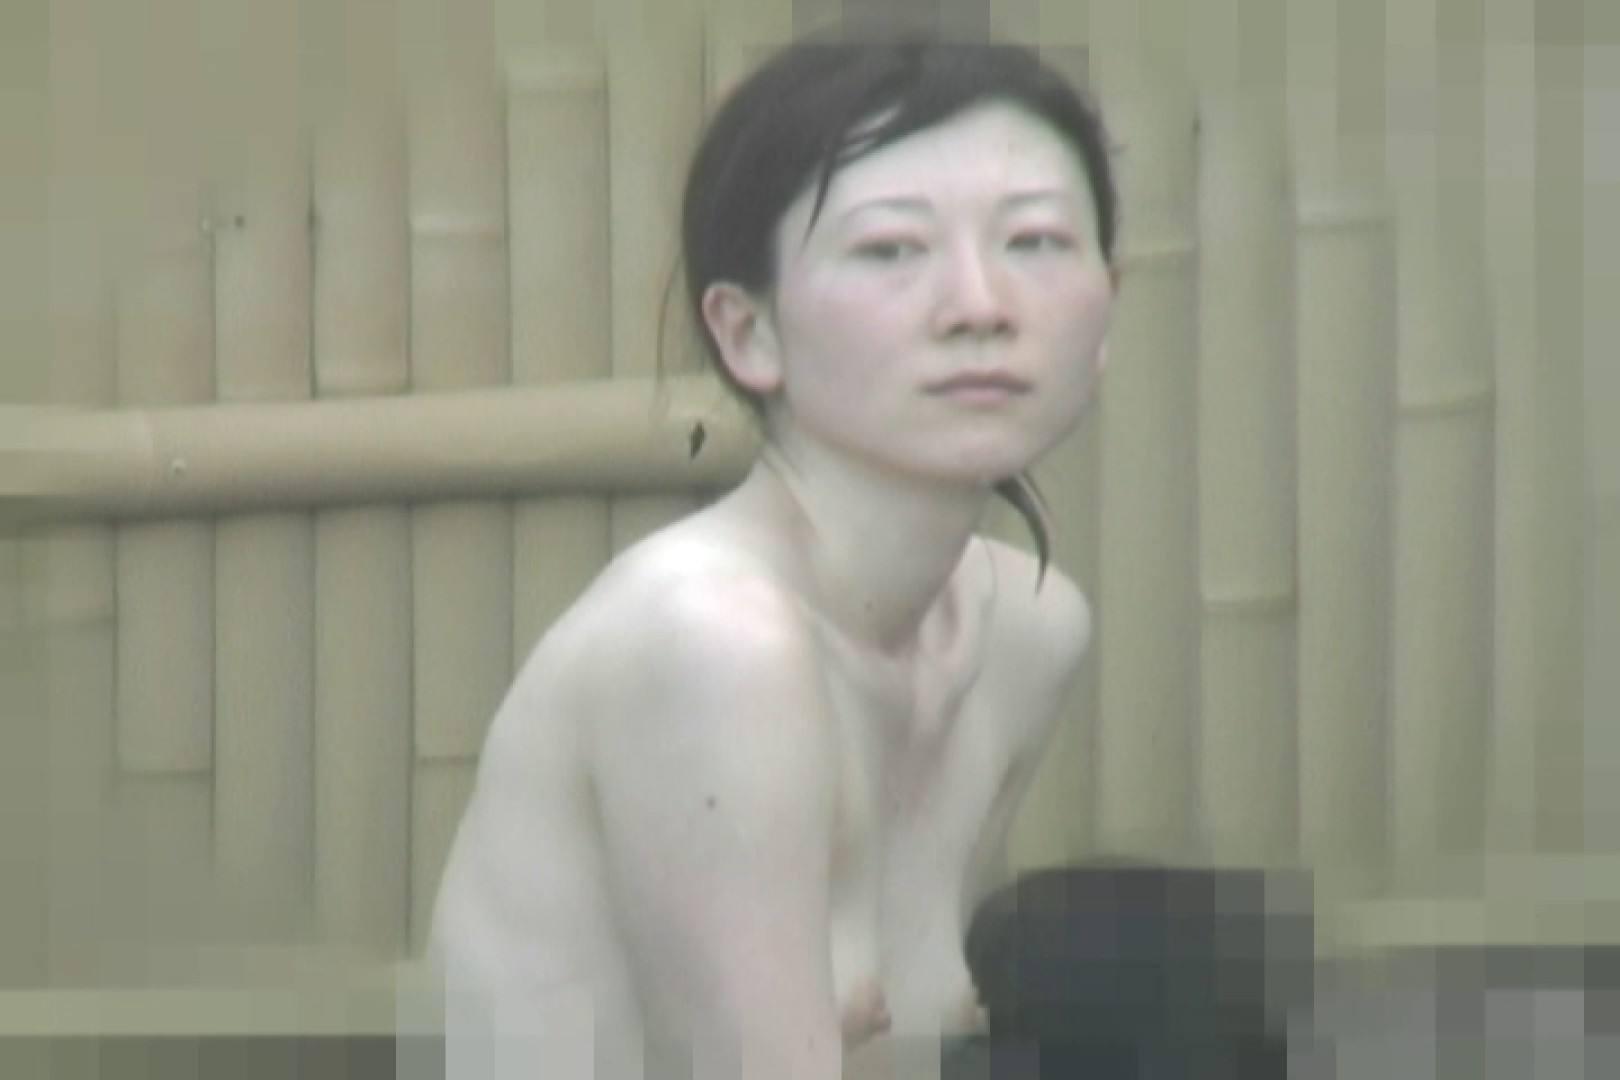 Aquaな露天風呂Vol.835 盗撮シリーズ   露天風呂編  92PIX 83